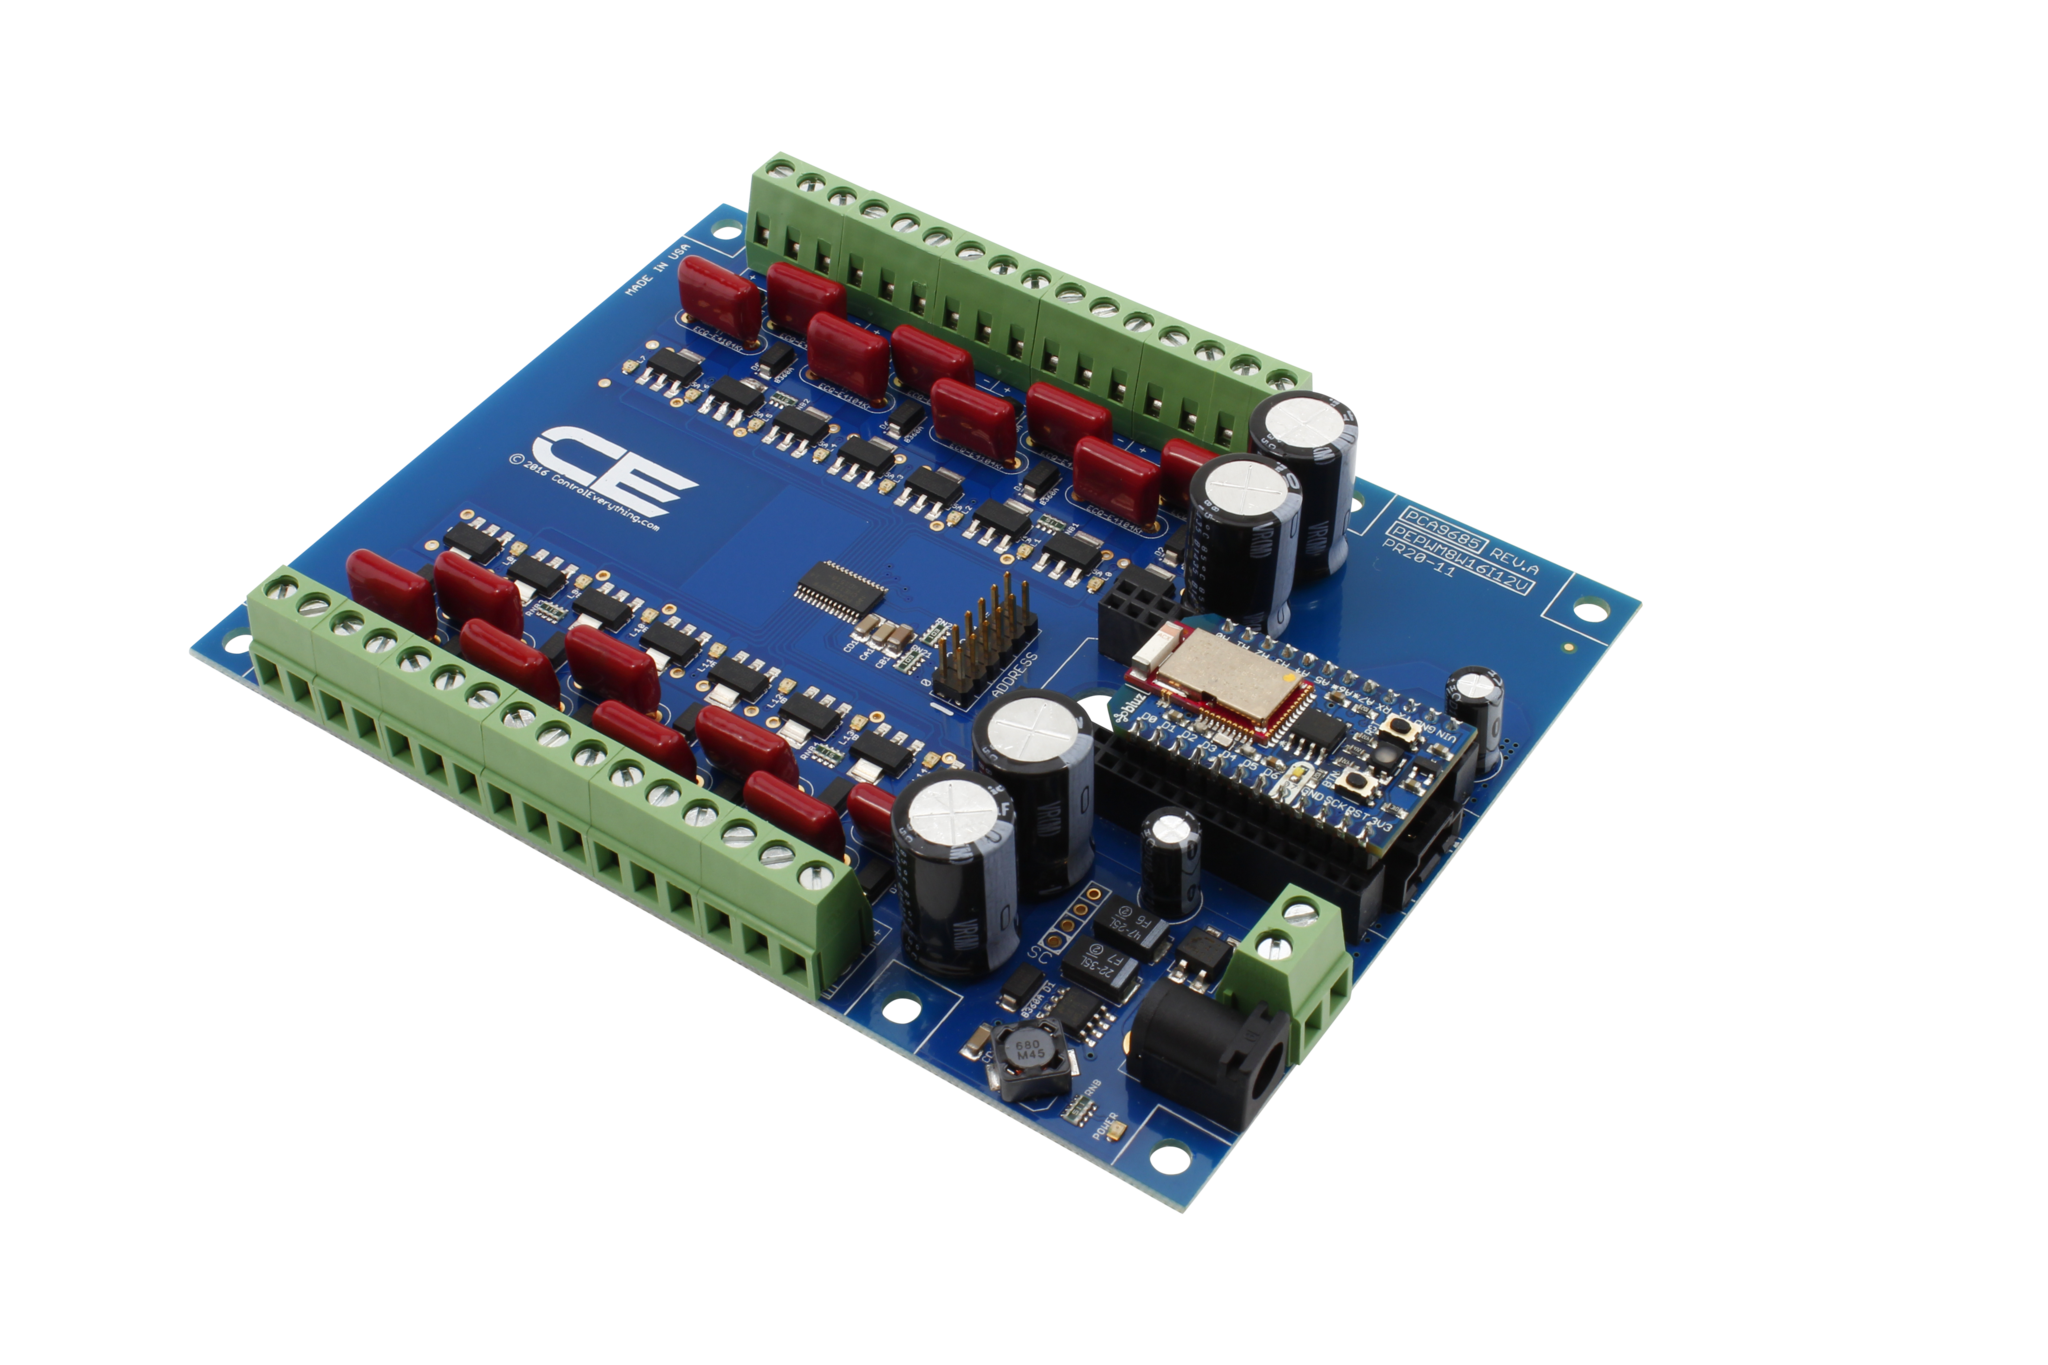 Pca9685 16 Channel 8w 12v Fet Driver Proportional Valve Controller 12 Volt Led Circuit I2c Shield For Particle Electron